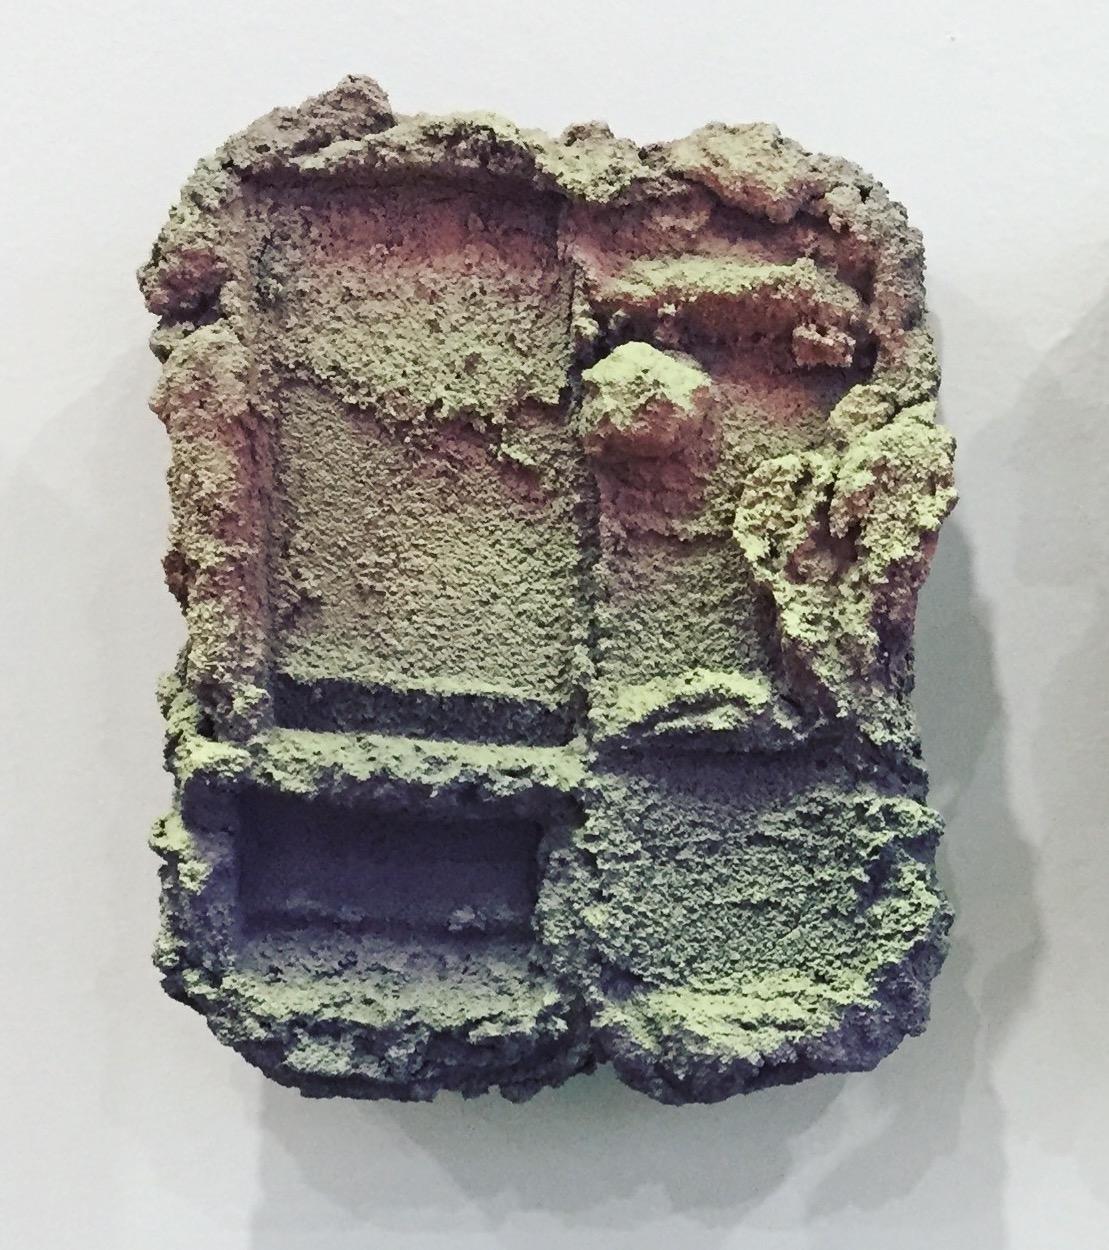 Brian Rochefort  Tablet 236 , 2017 ceramic, glaze 9 x 7 x 3 in.